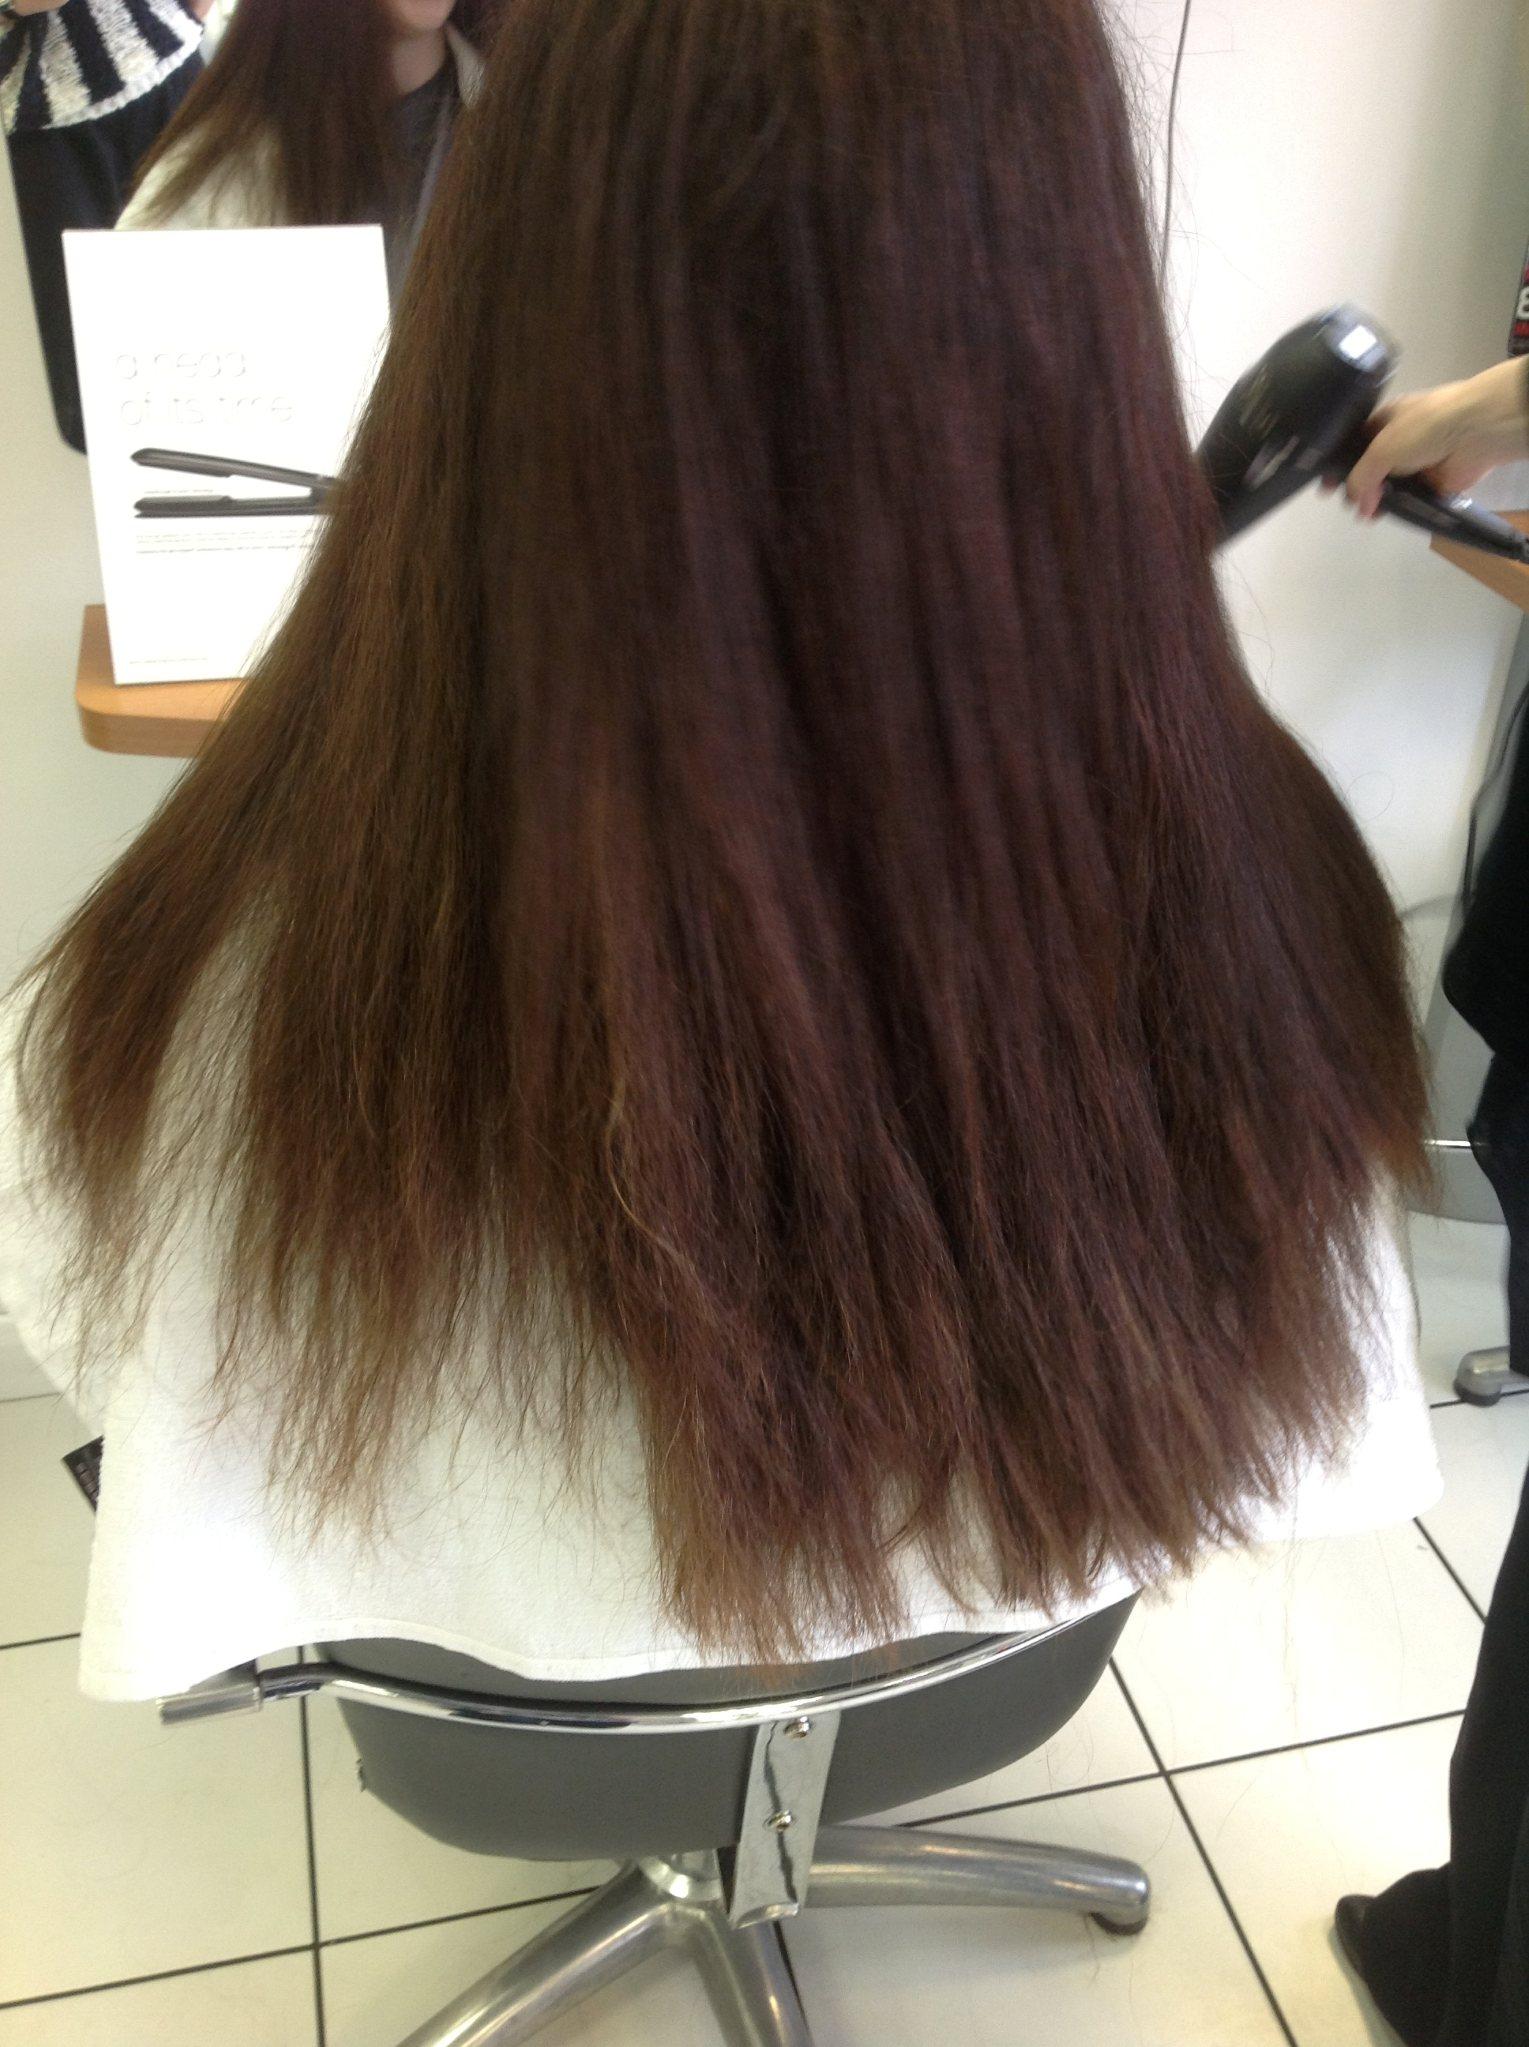 Brazilian Blow Dry : Brazilian Blow Dry Treatments - Pure Hair Design